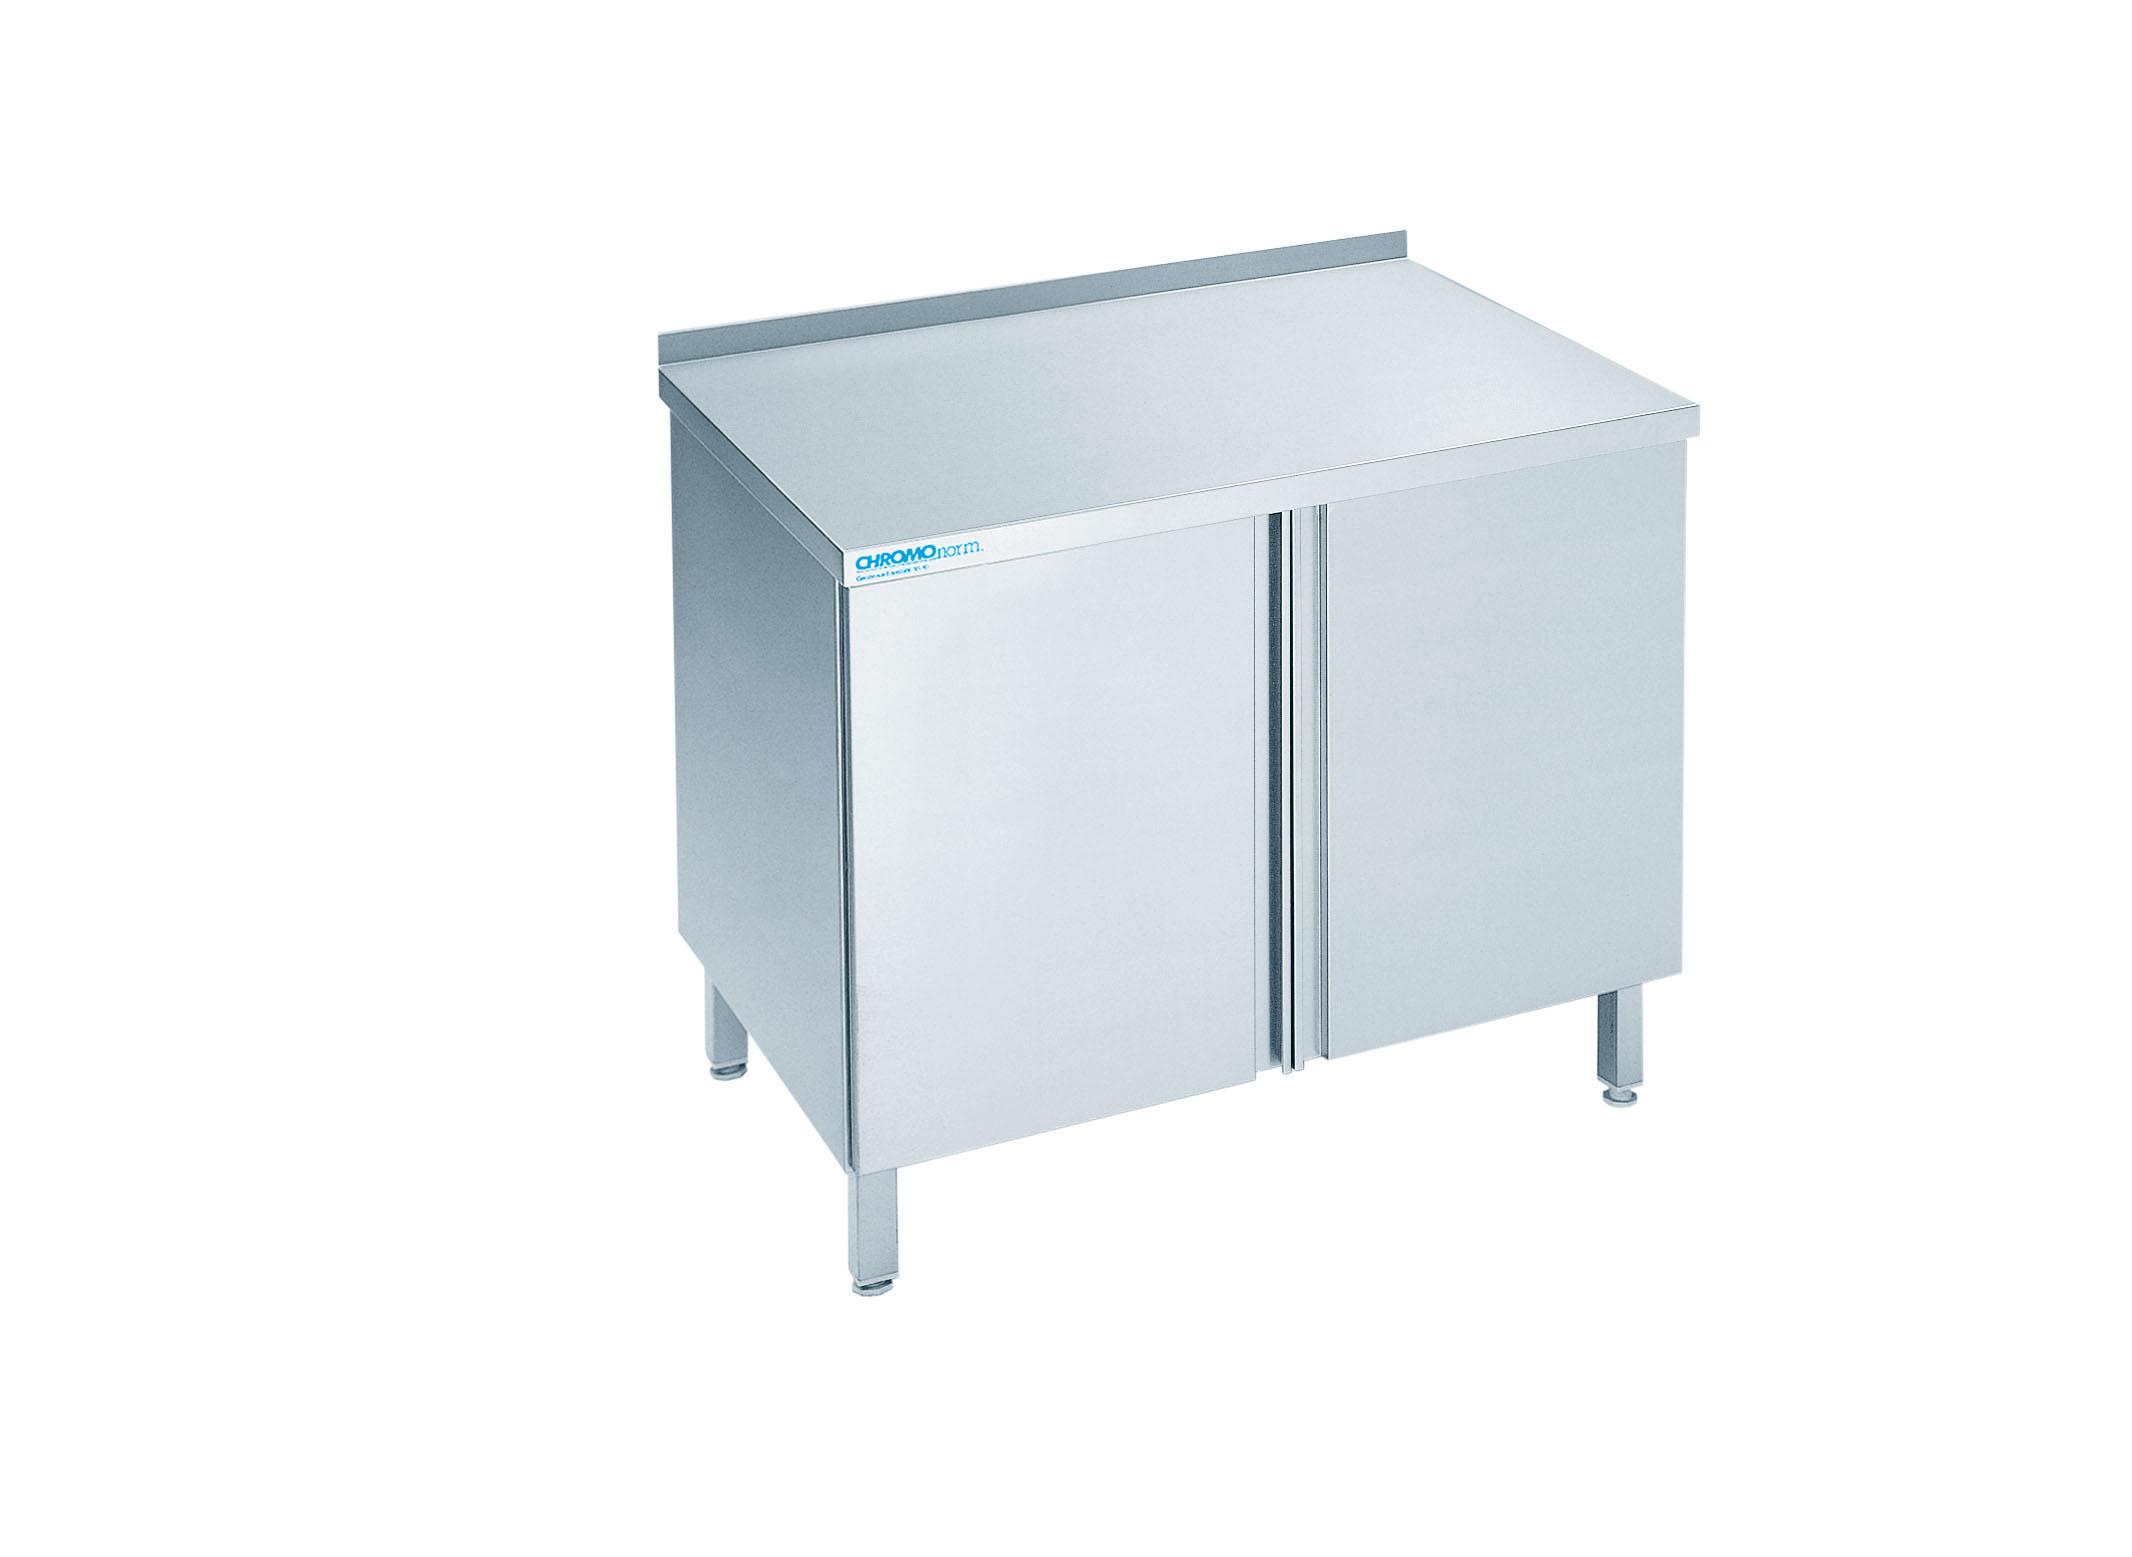 Kühlschrank Gebraucht : Kühlschrank gebraucht berlin pankow medimax homepage